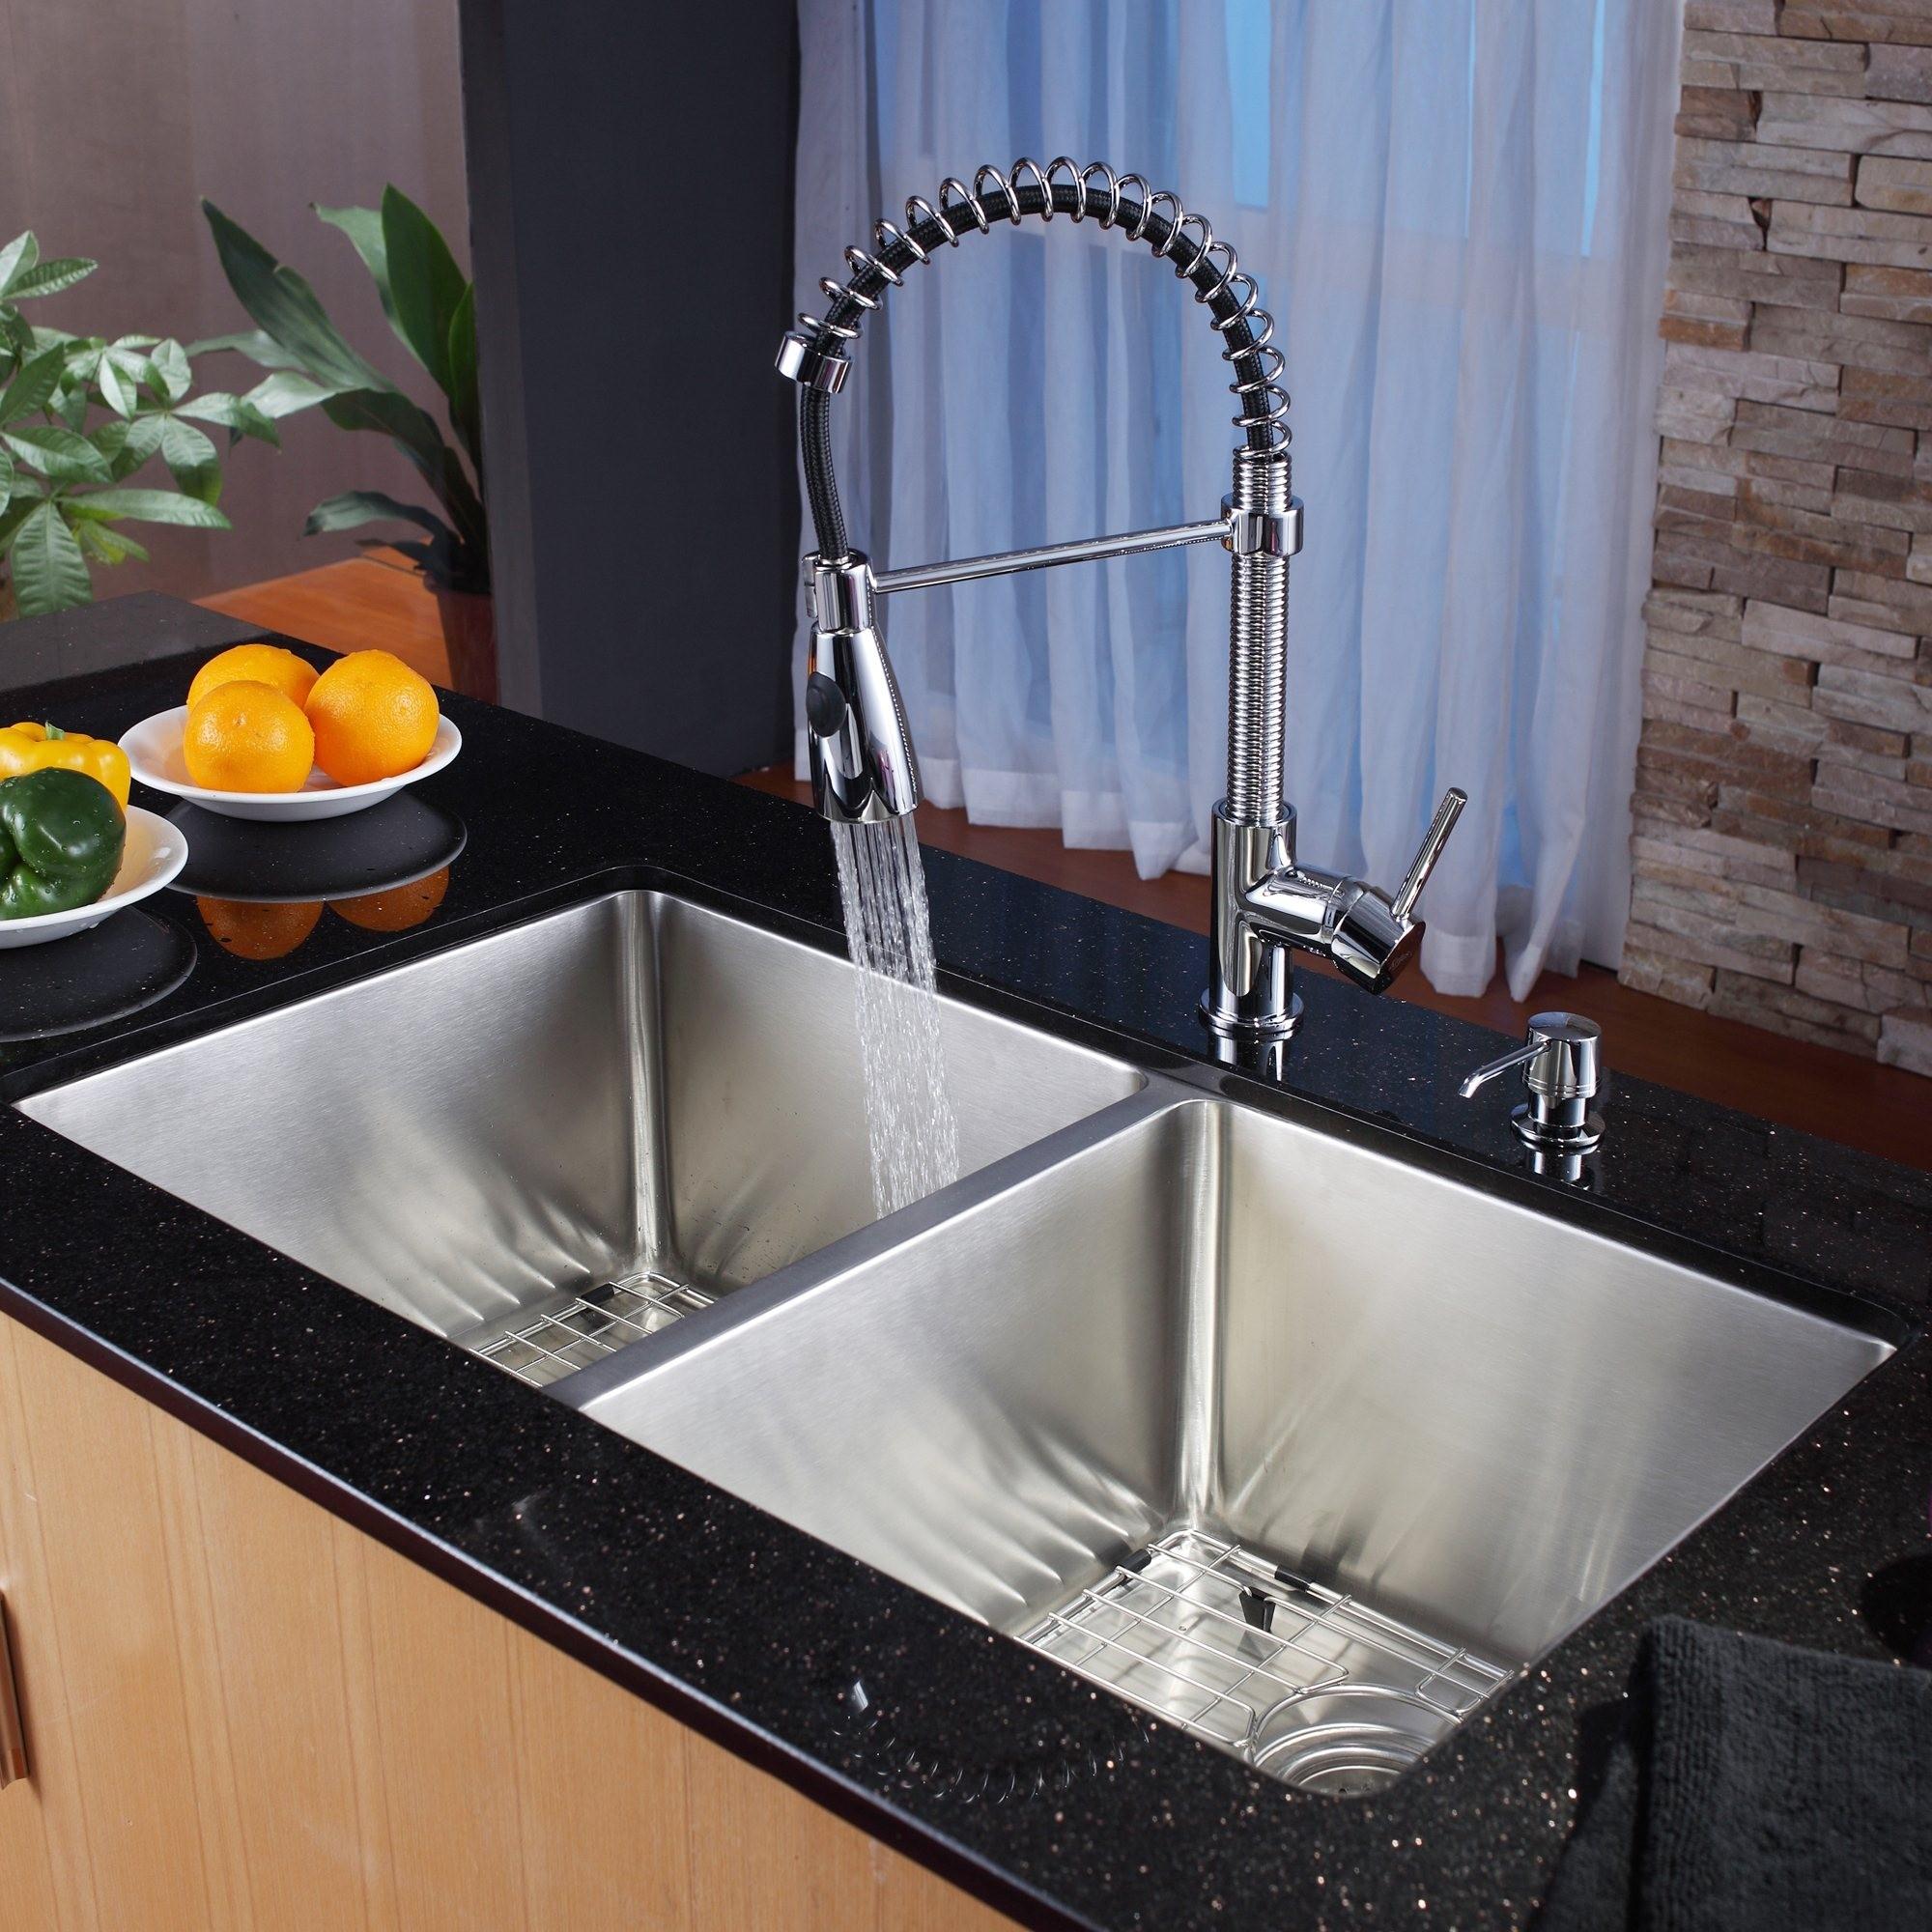 Ideas, undermount kitchen sink and faucet combo undermount kitchen sink and faucet combo stainless steel kitchen sink combination kraususa 2000 x 2000 1  .